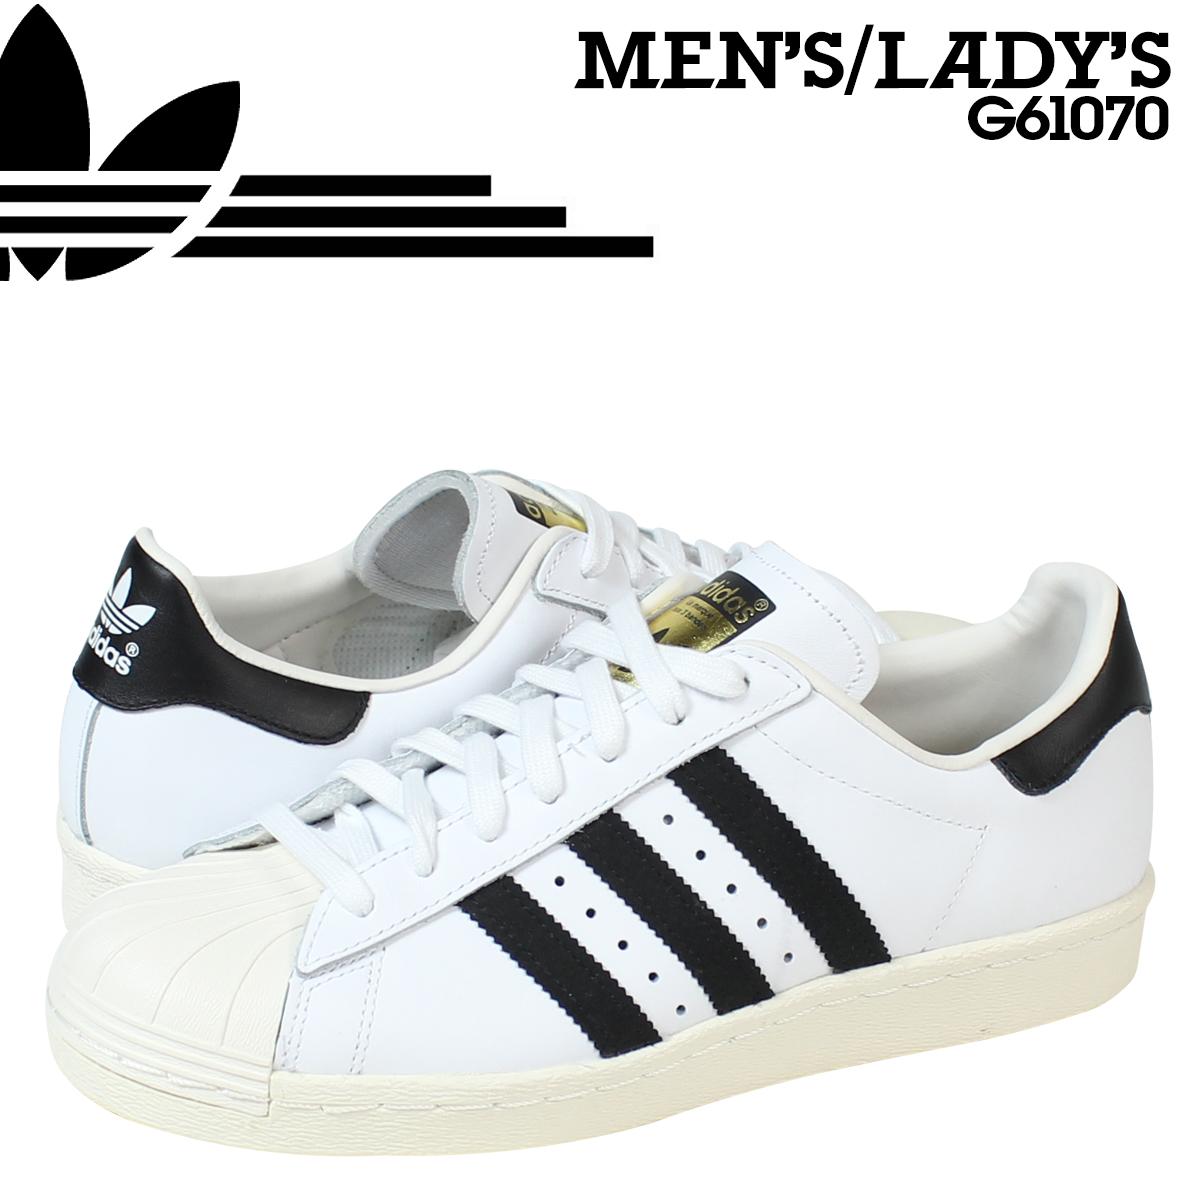 Adidas originals adidas Originals superstar 80s sneakers men gap Dis SUPERSTAR white white G61070